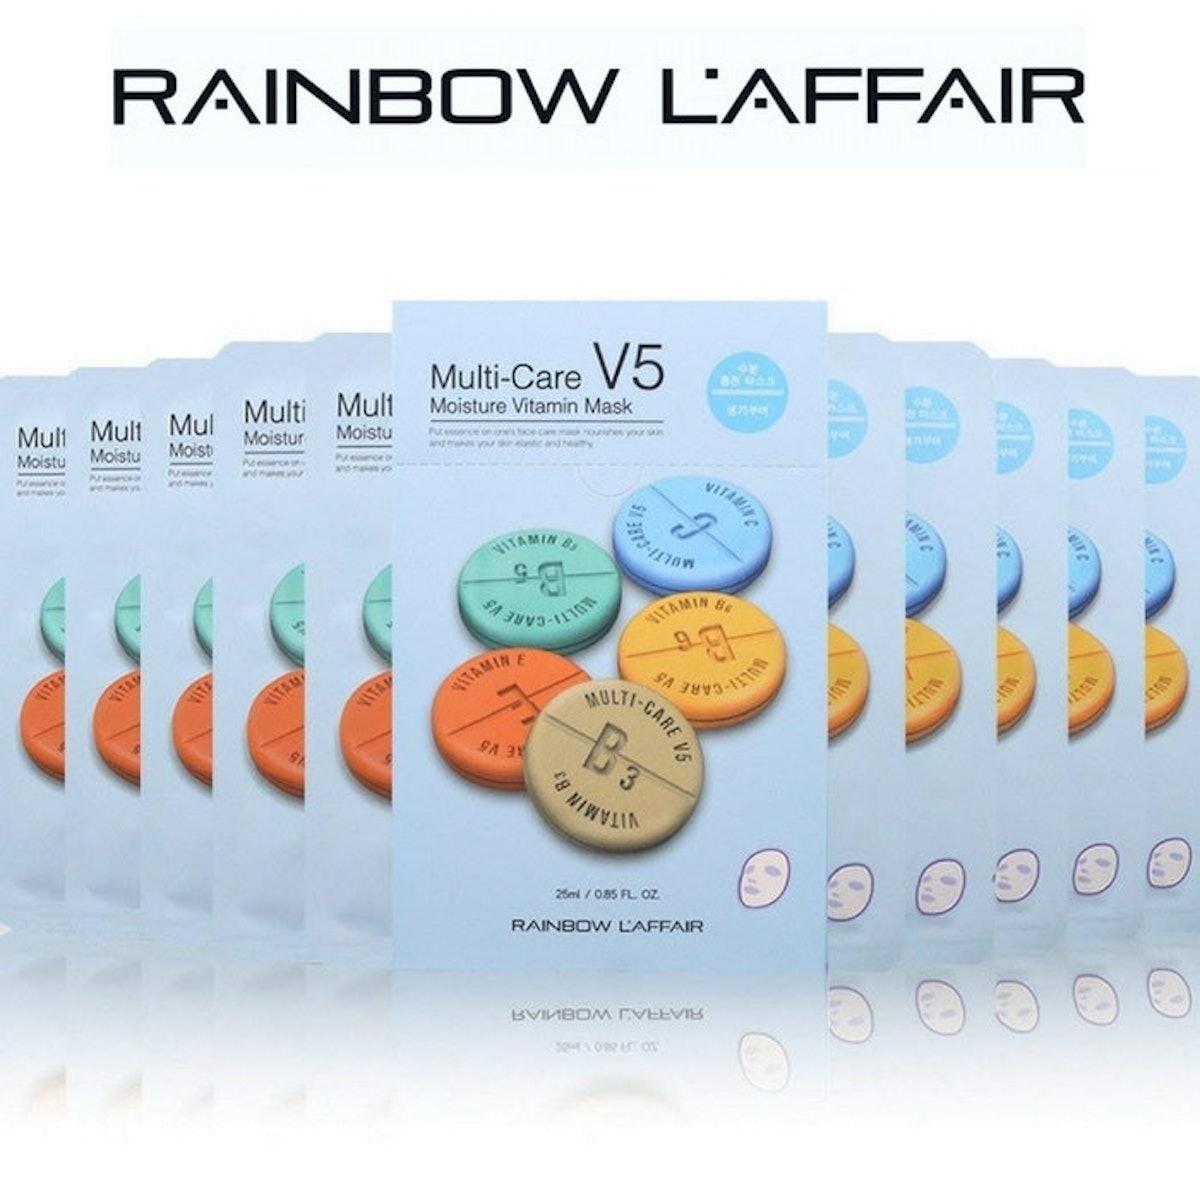 Rainbow L'Affair Multi-Care Sheet Masks